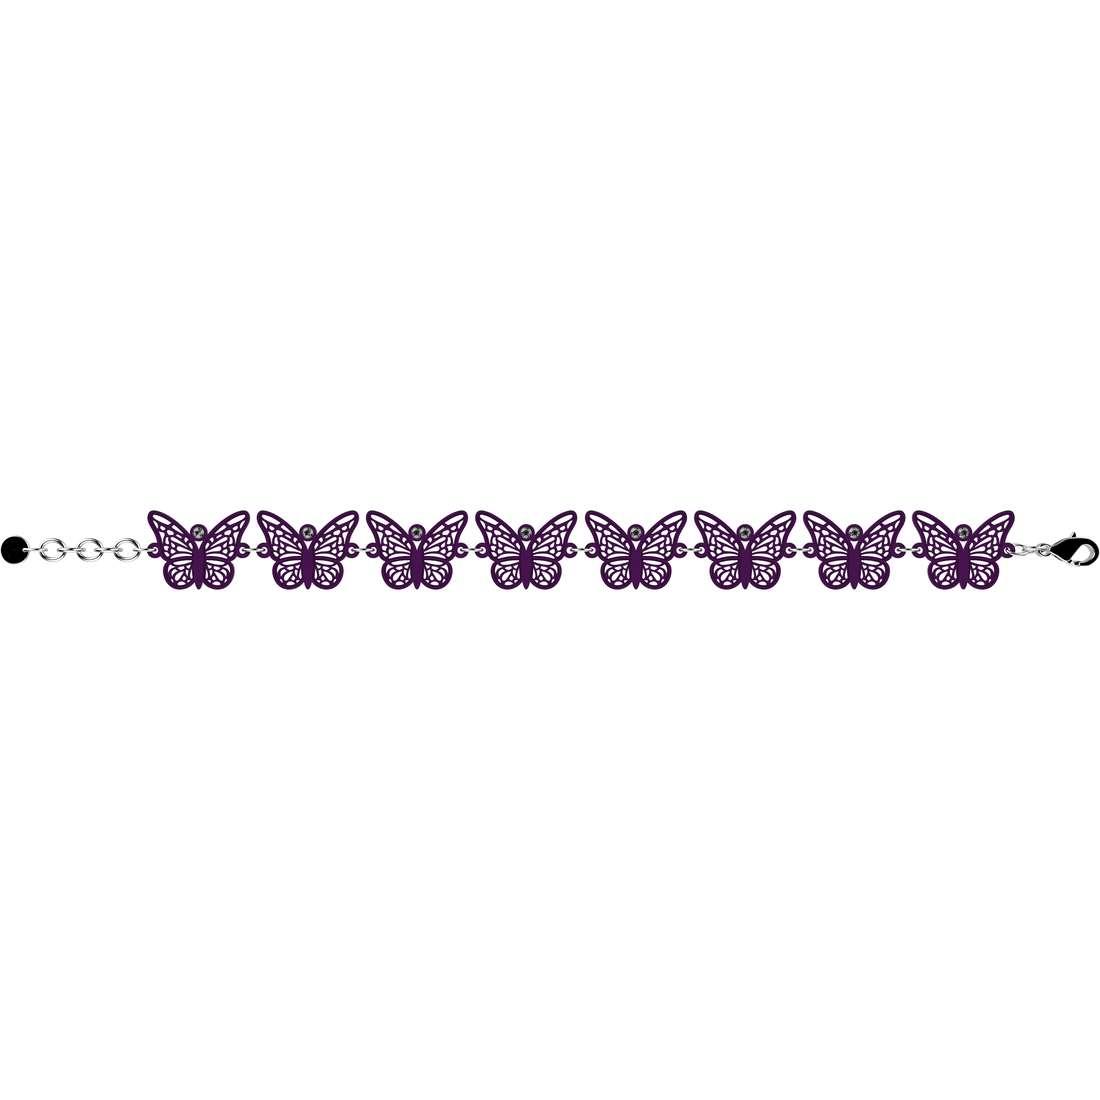 bracelet woman jewellery Too late 8052145222900